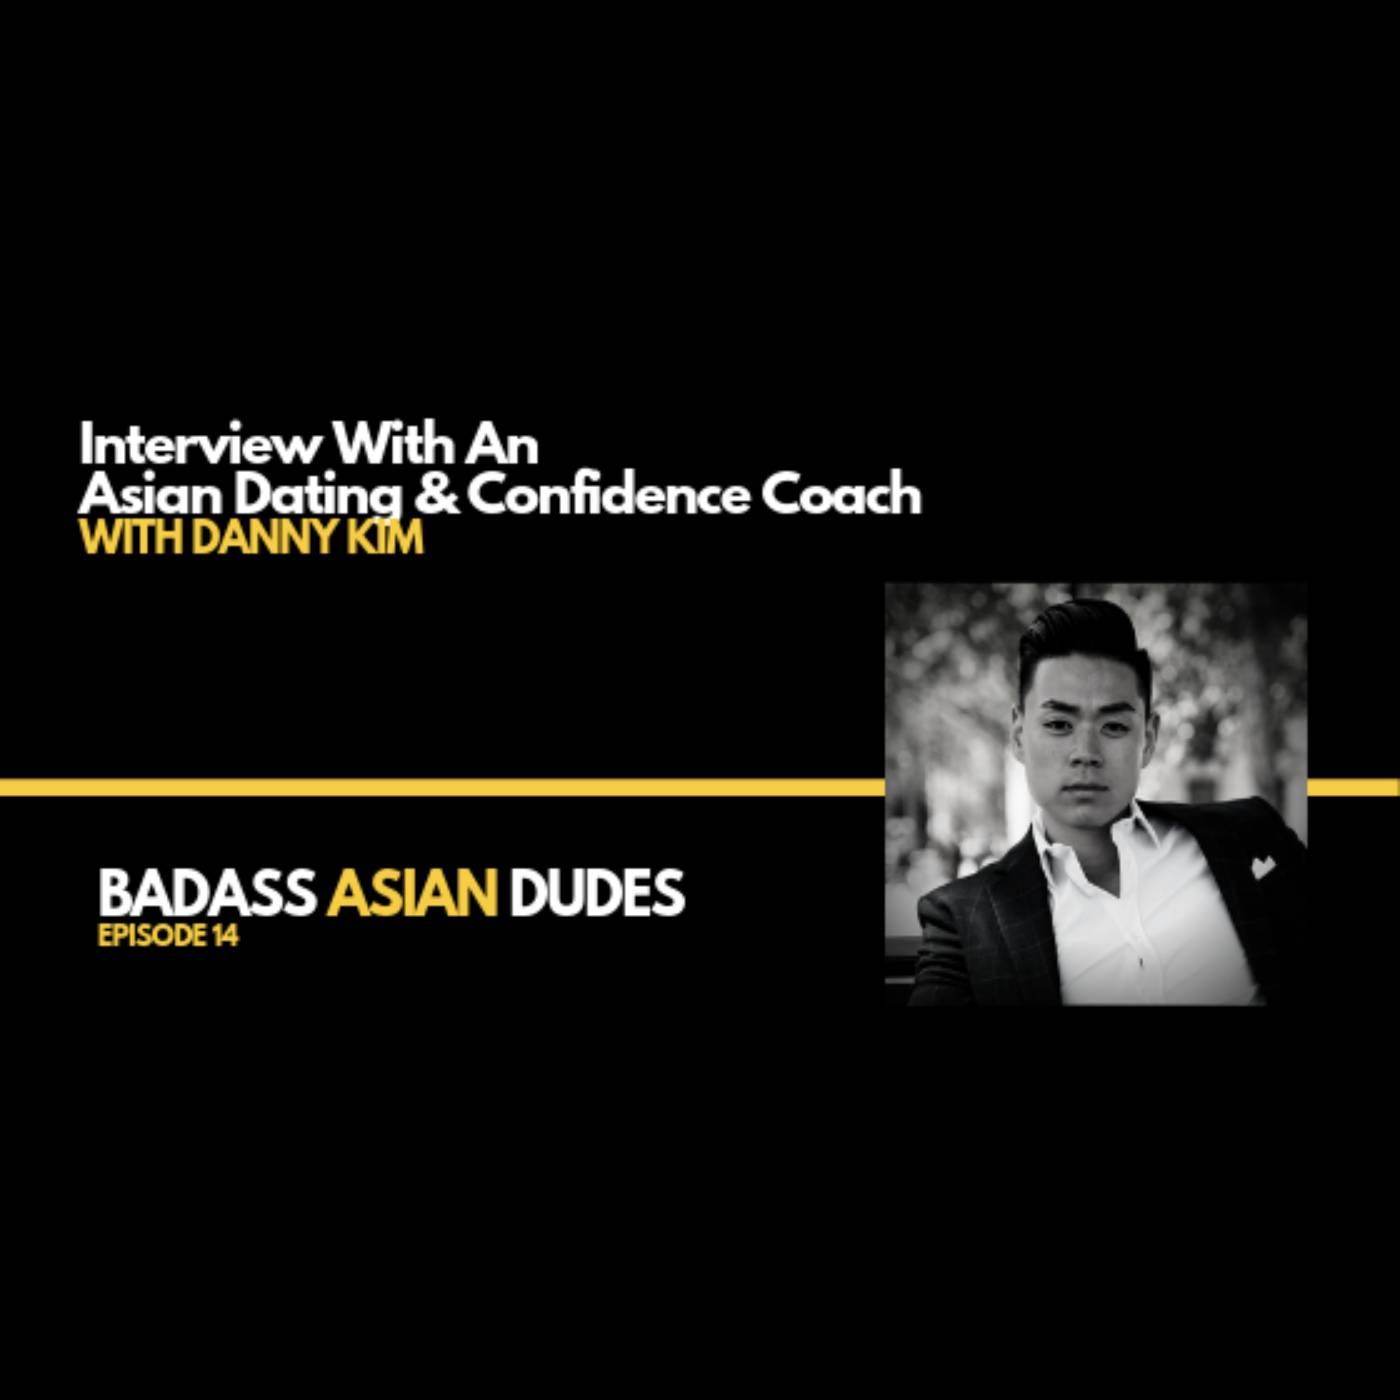 Artwork for podcast Badass Asian Dudes